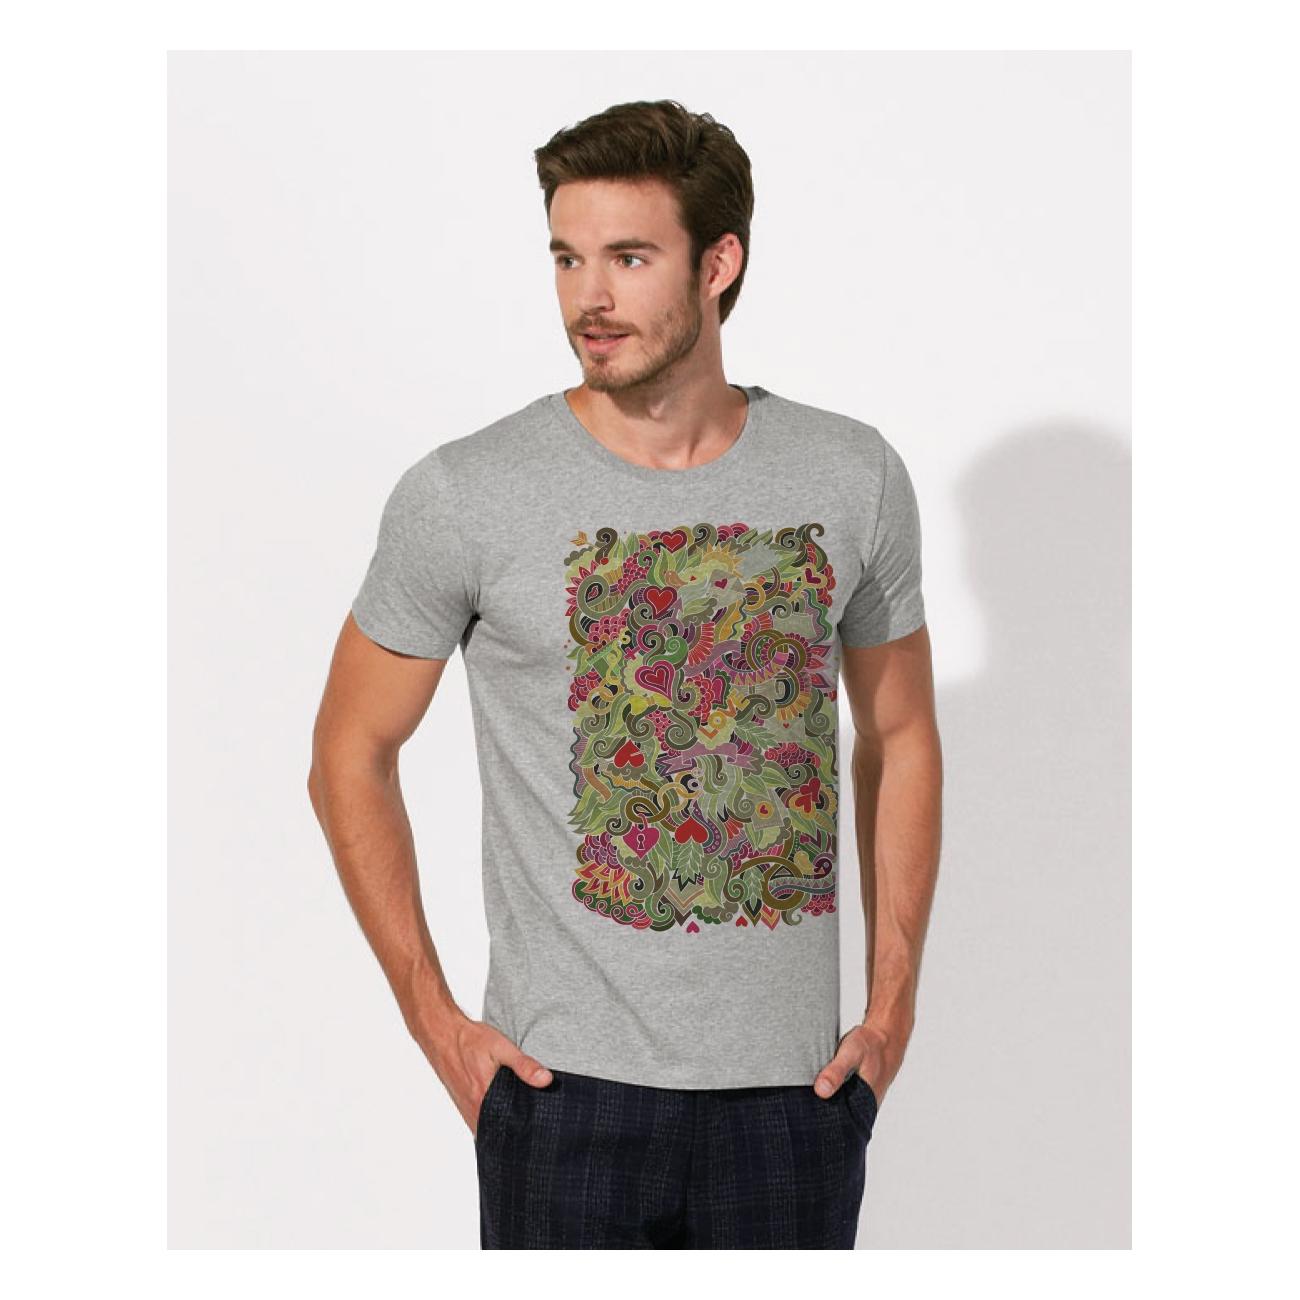 https://tee-shirt-bio.com/3688-thickbox_default/tee-shirt-coton-bio-col-gris-clair-chine-impression-numerique-couleur.jpg